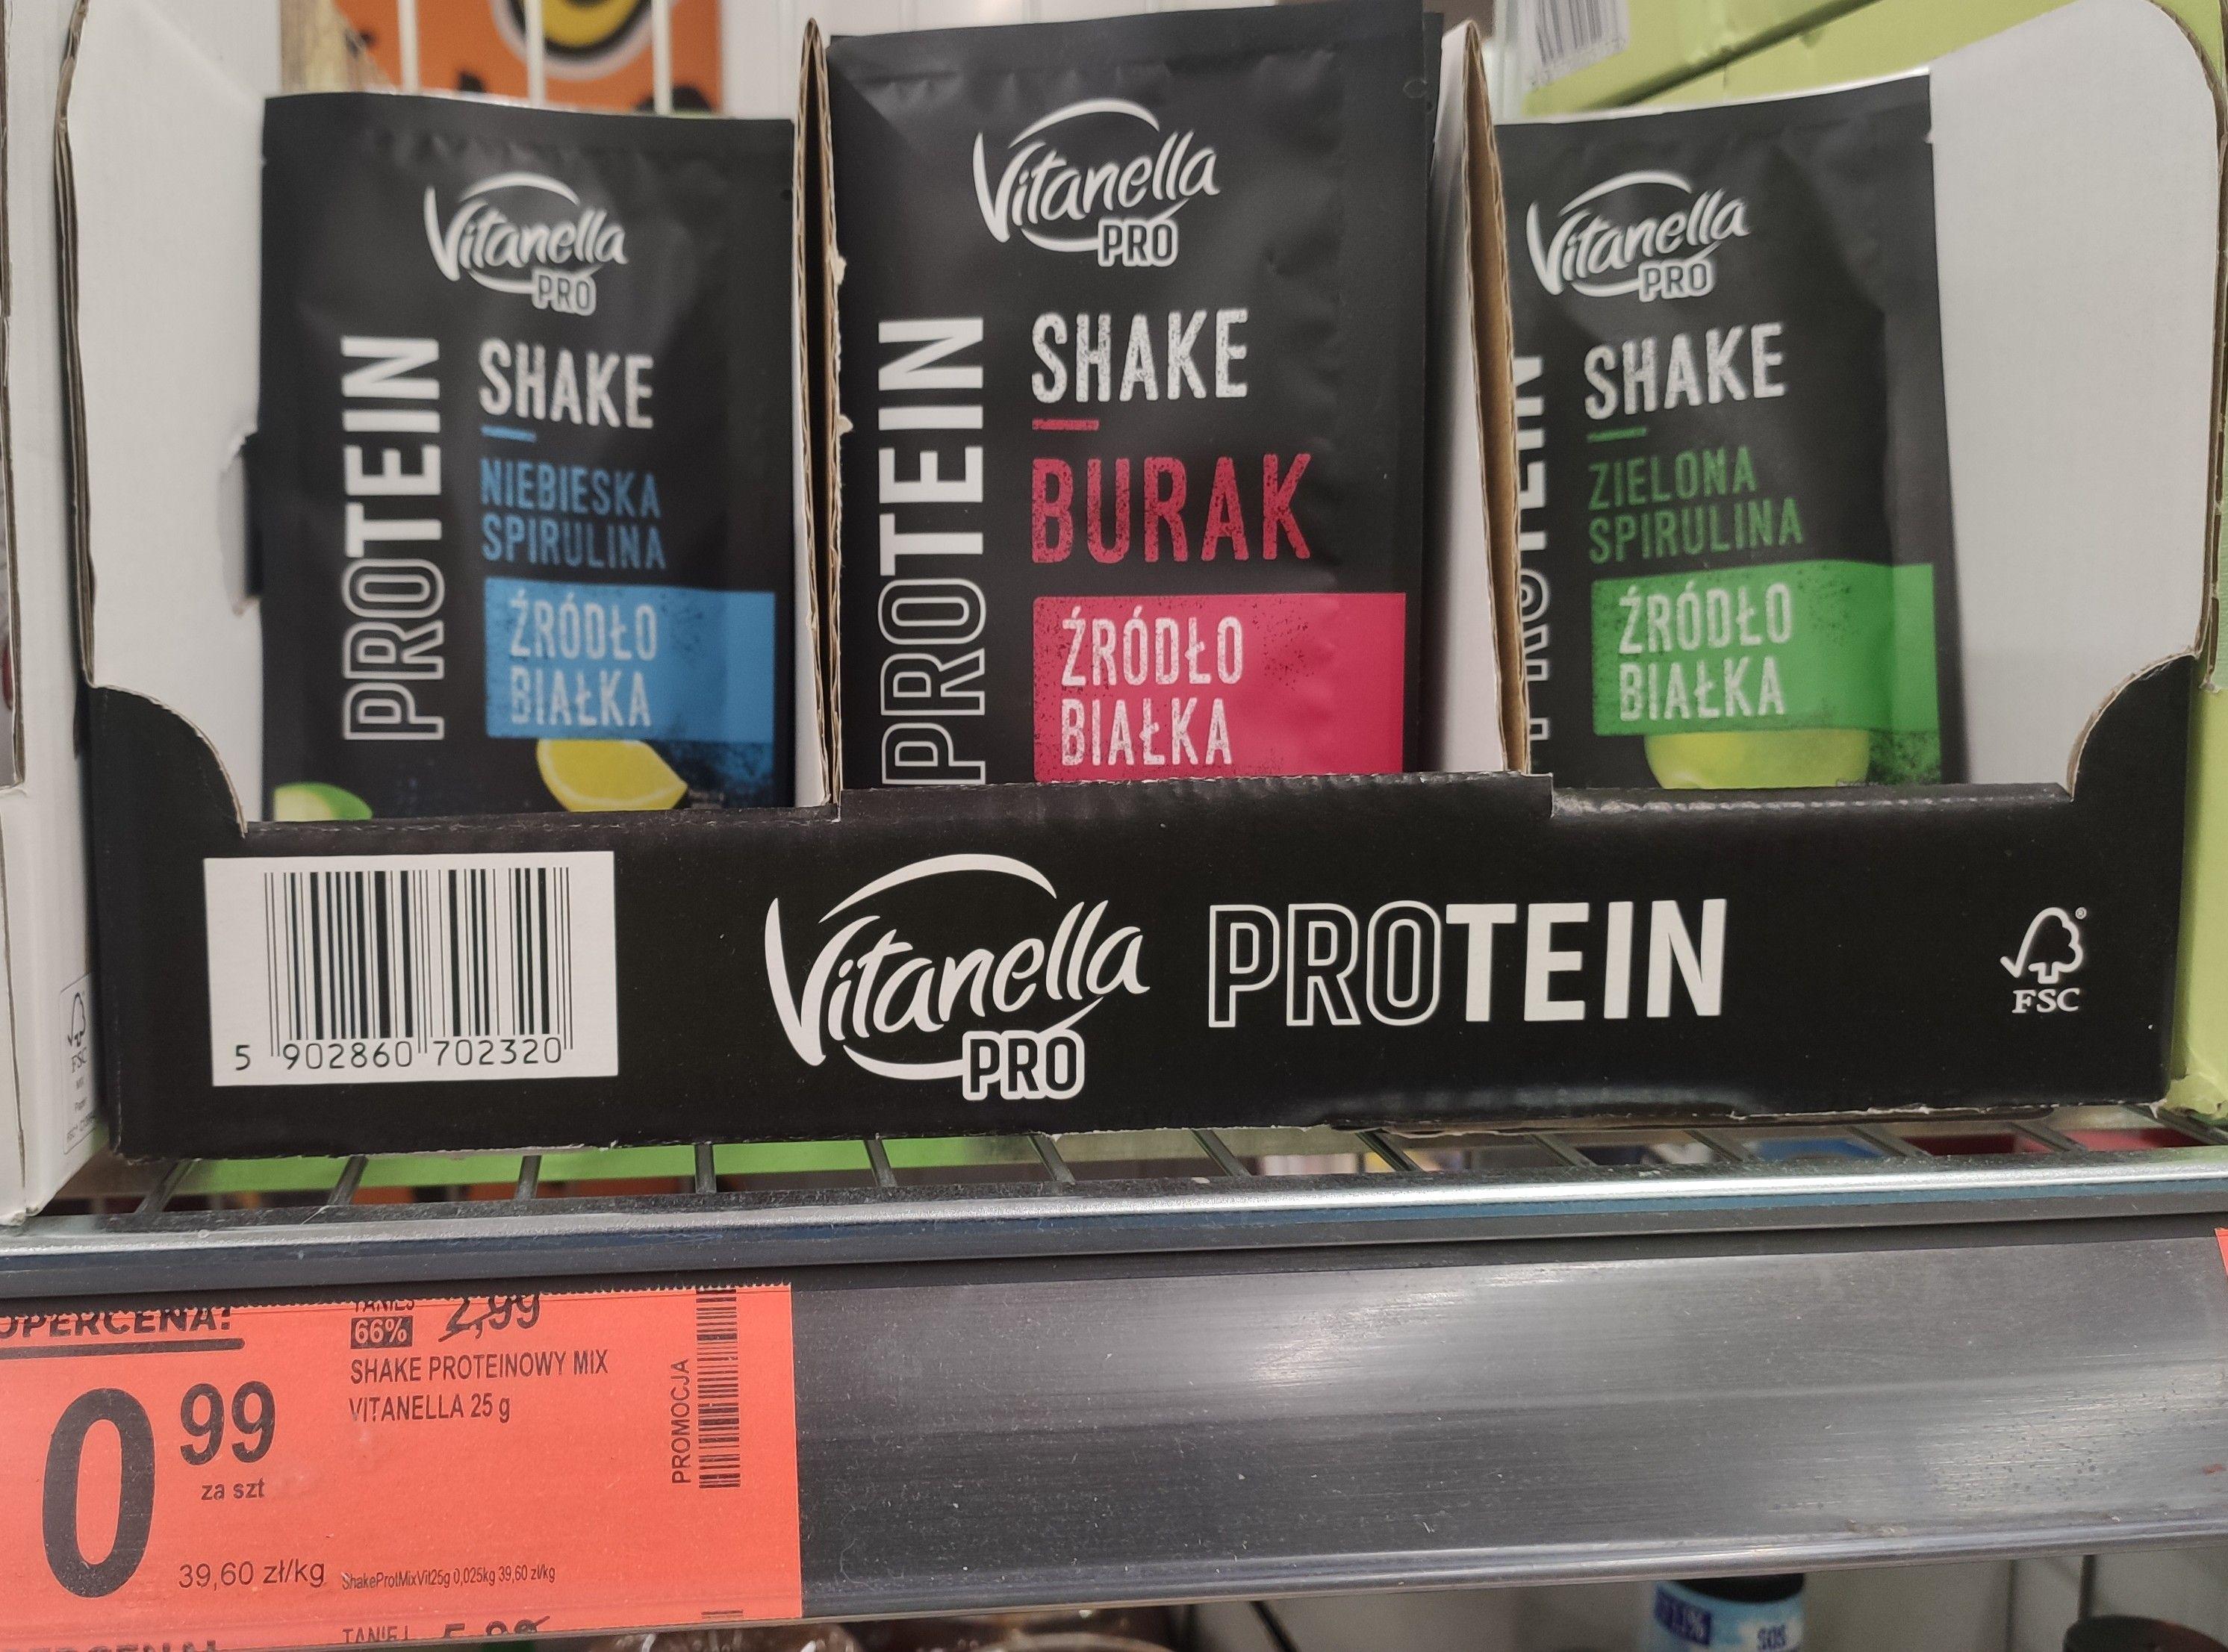 Vitanella Pro Protein Shake